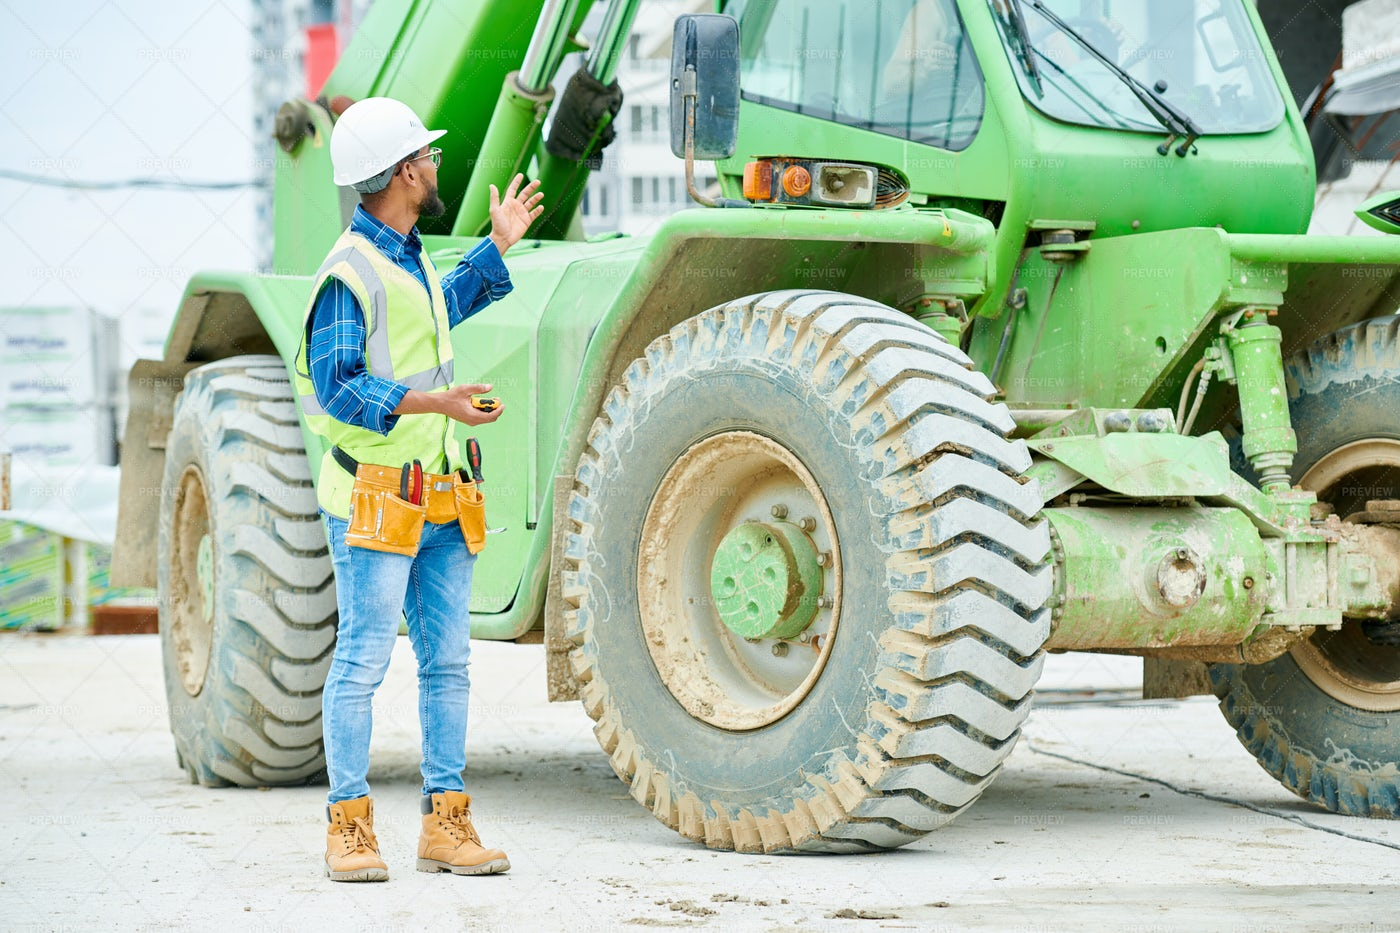 Workman By Industrial Excavator: Stock Photos